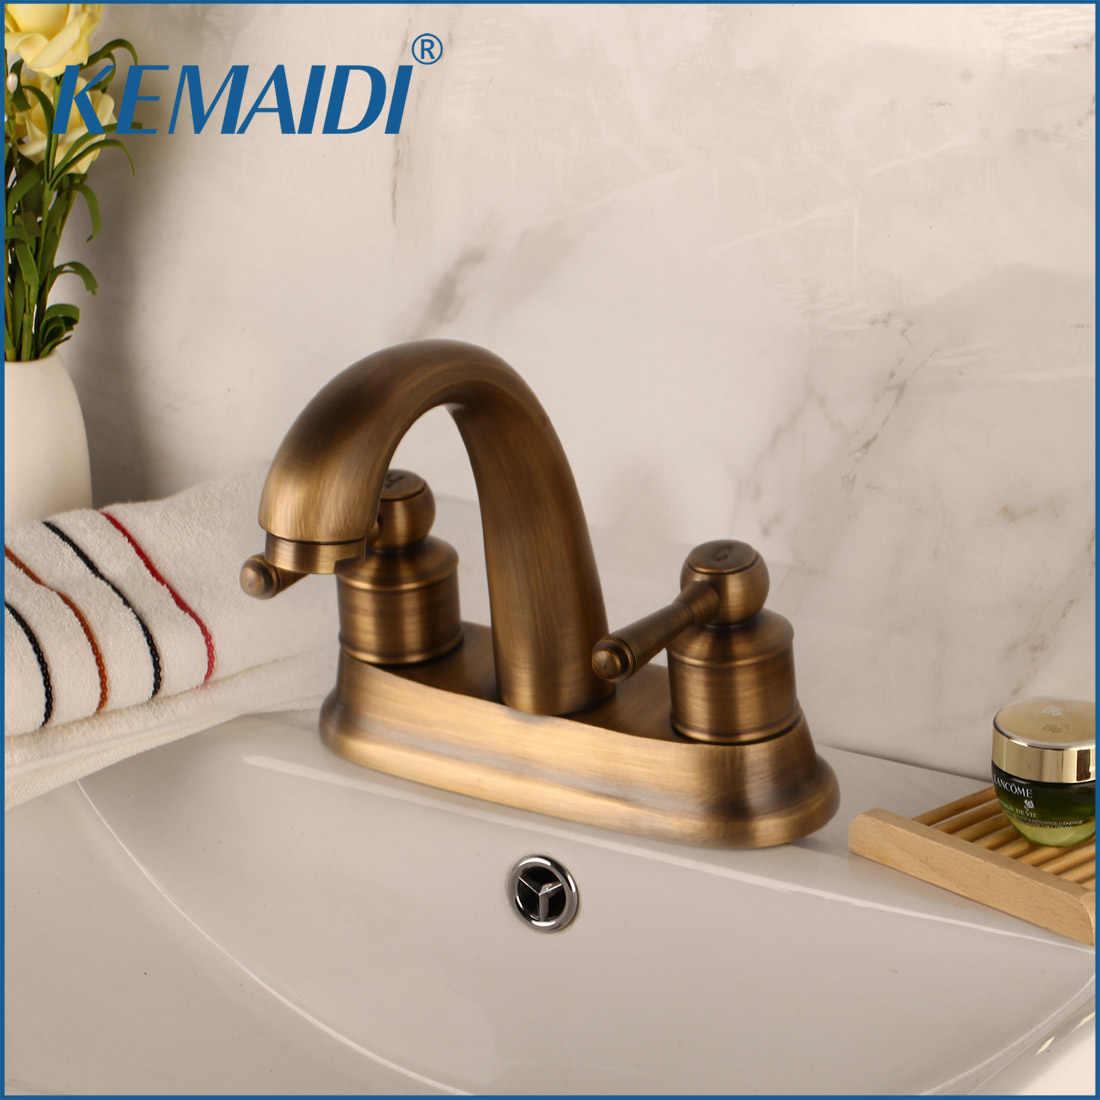 Kemaidi Hot Sale Bathroom Faucet Doule Handle Antique Brass Stream